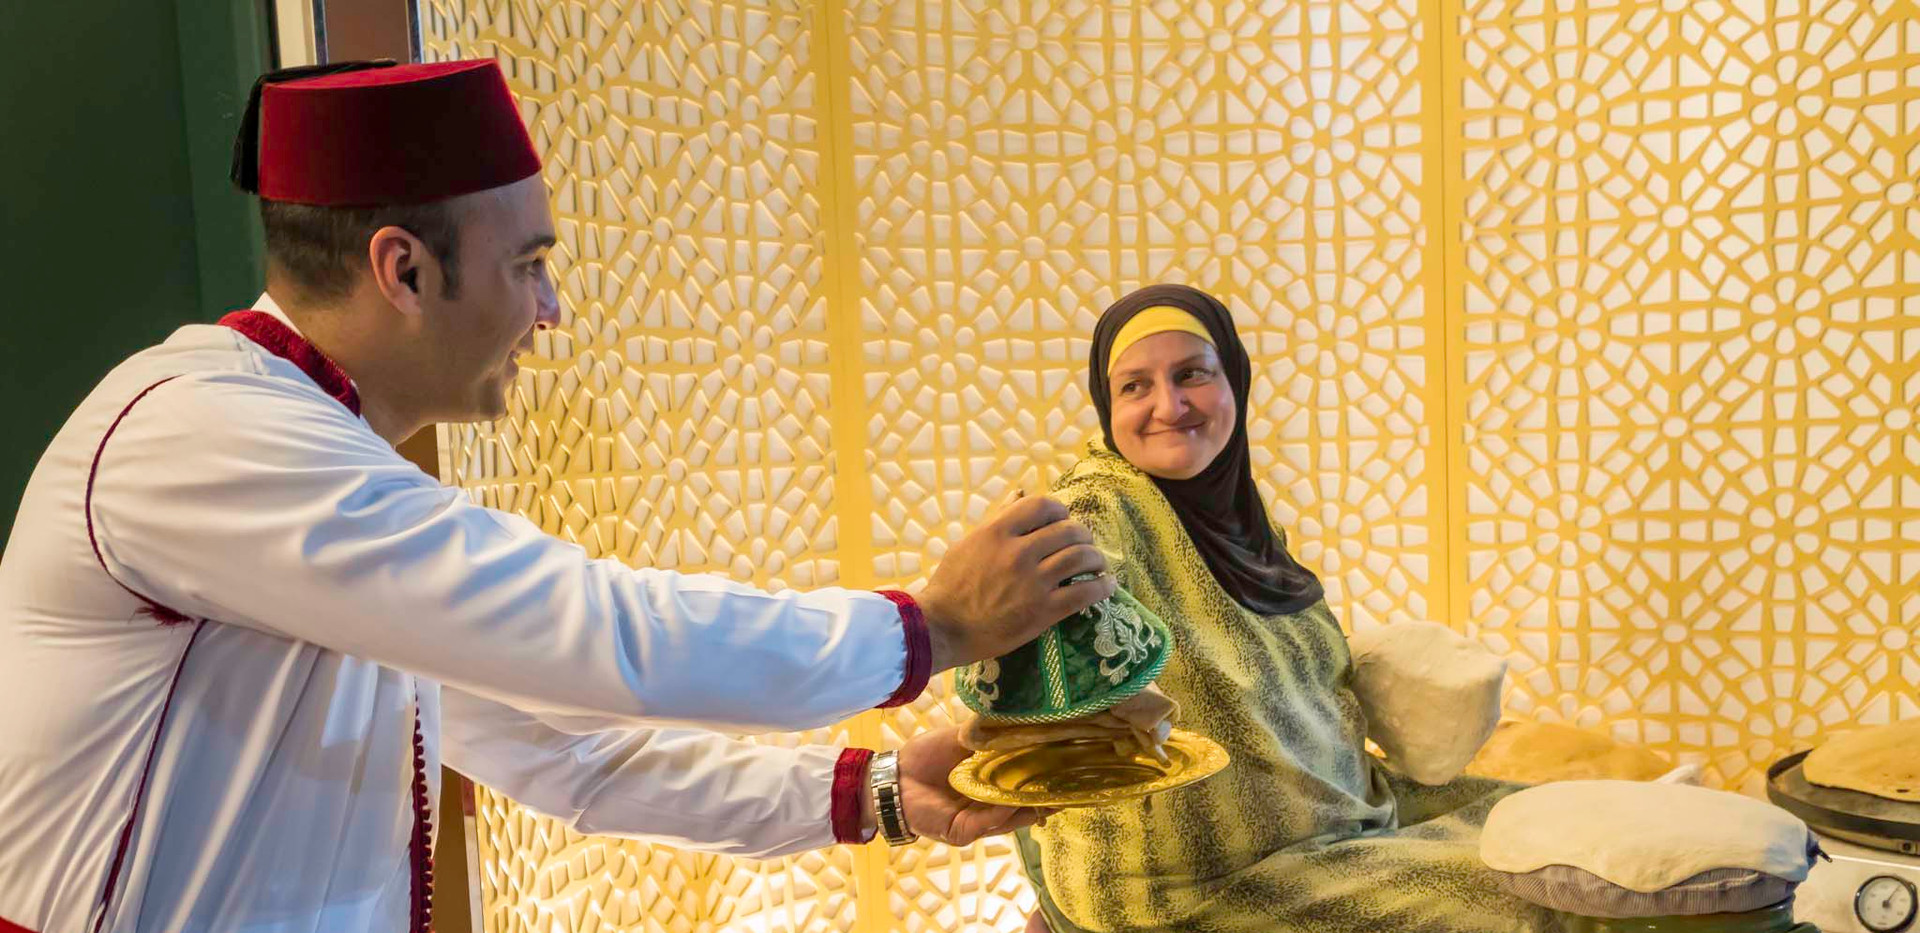 Celebrate Valentine's at Mashawi Nights, Zaytoun